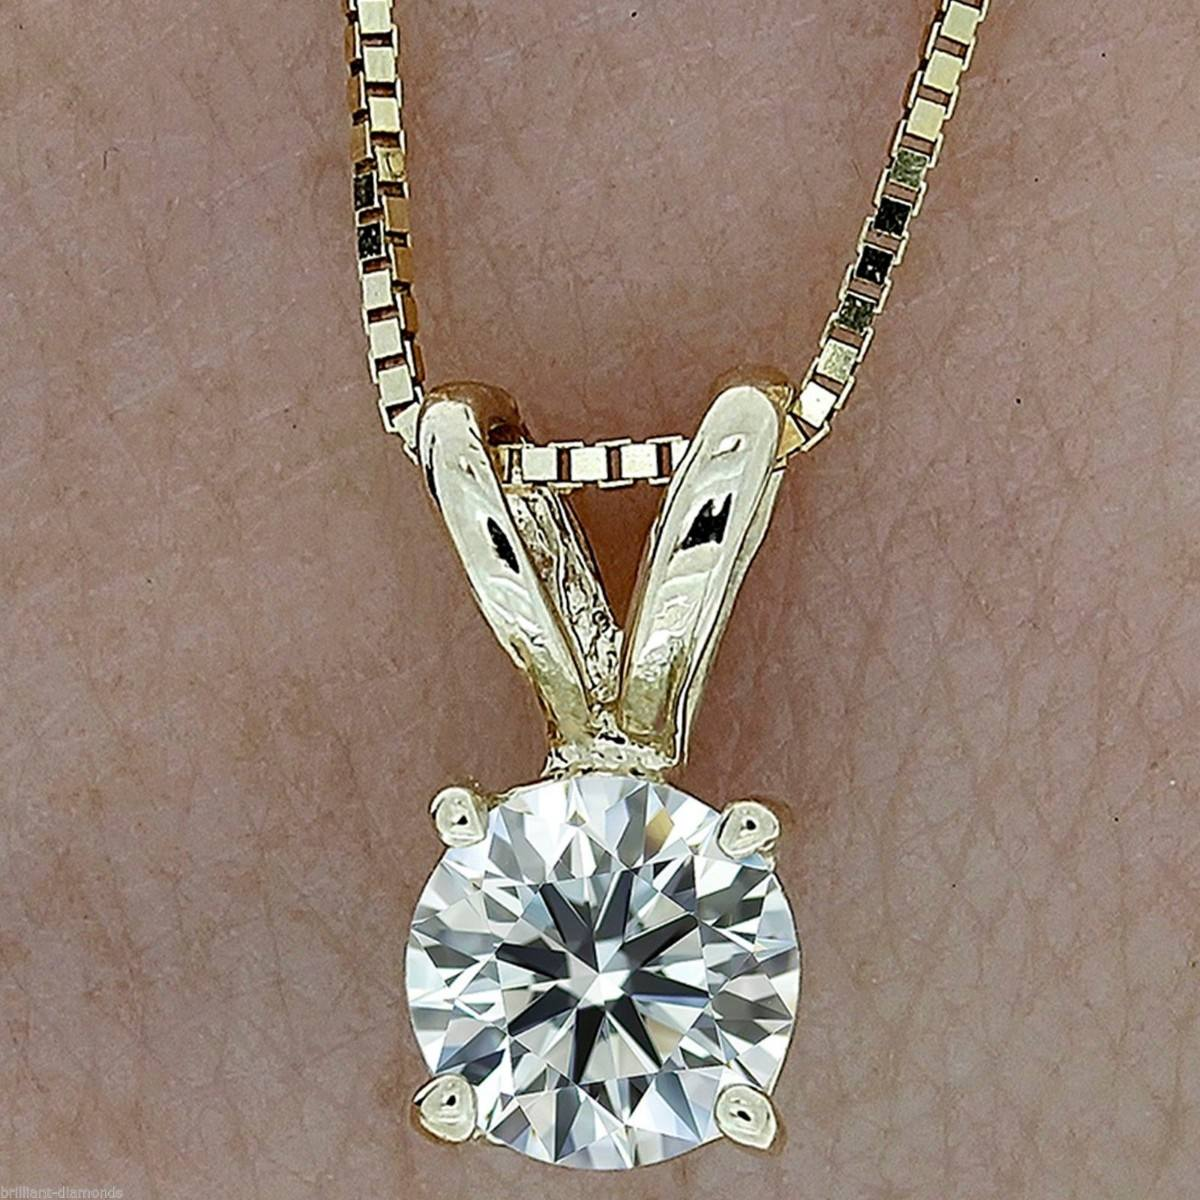 ef4cfac298e2 dije oro 14k diamante 100% natural si1 h .20 cts unisex. Cargando zoom.